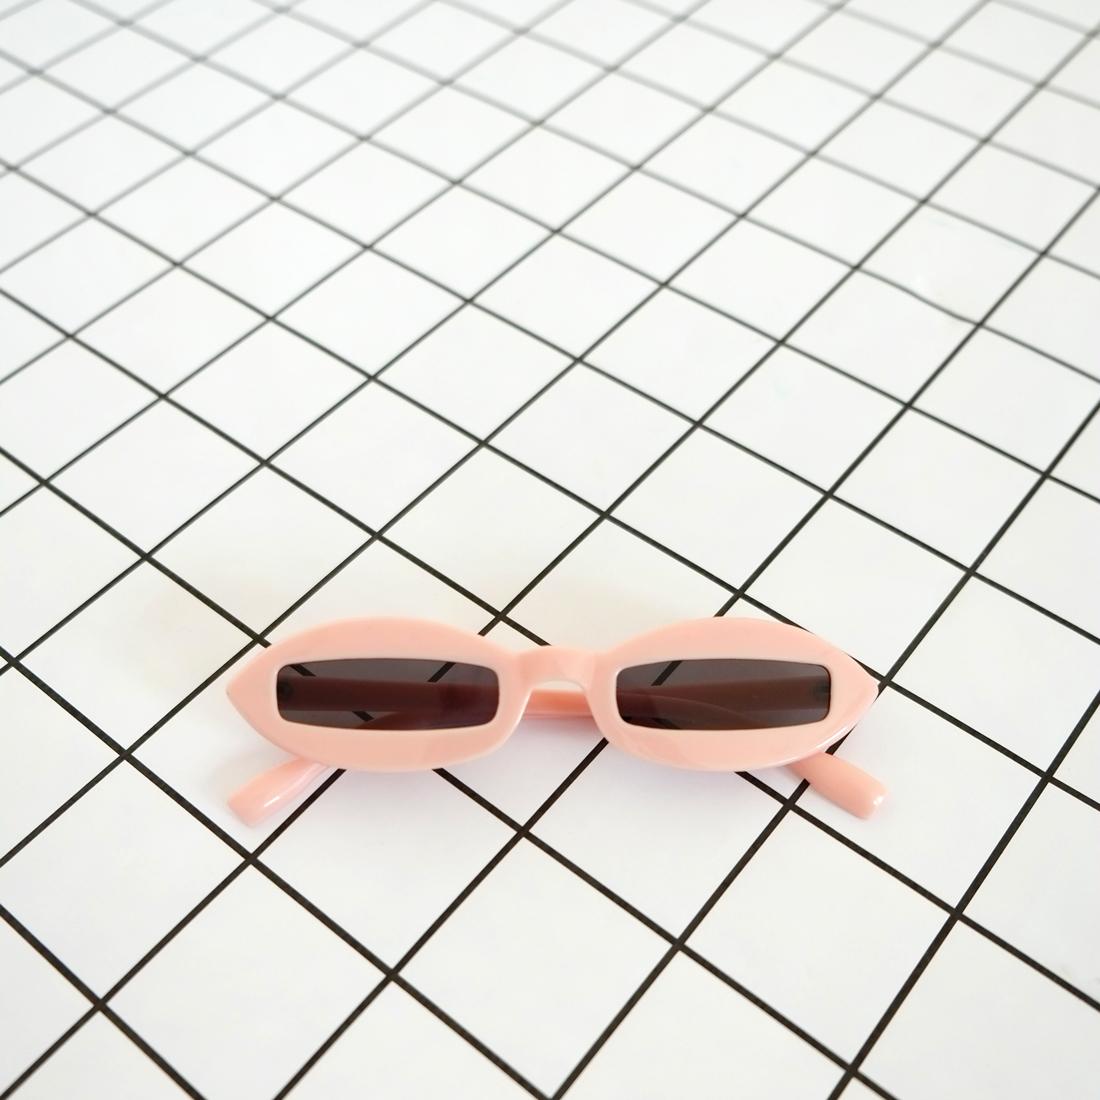 glassespink5